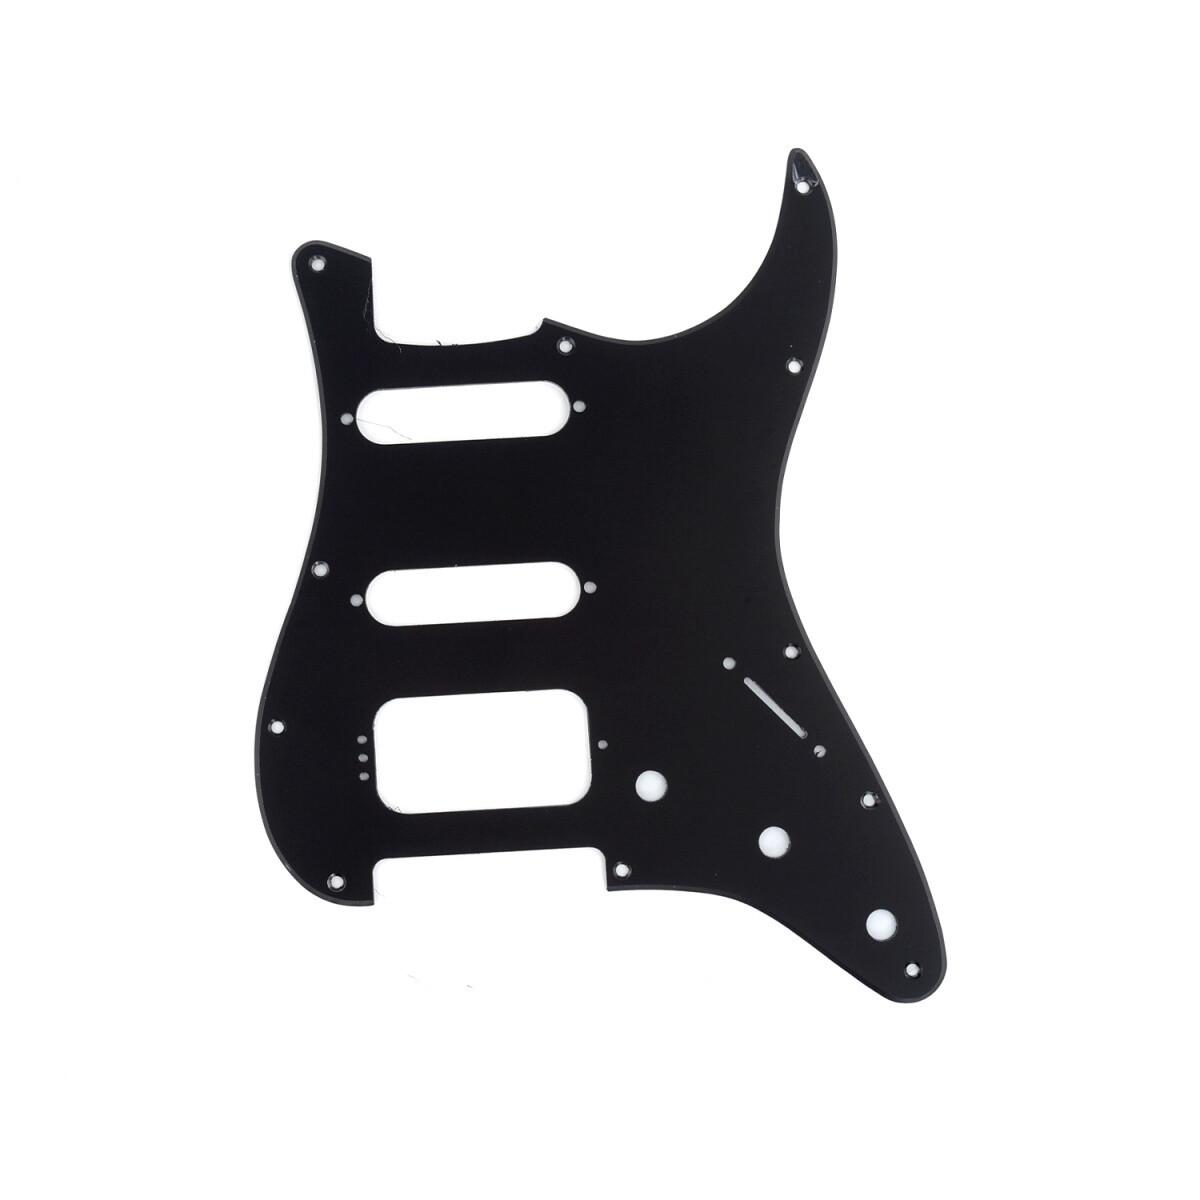 Brio 11-Hole Modern Style Strat HSS Pickguard for American Stratocaster Matte Black 1 Ply